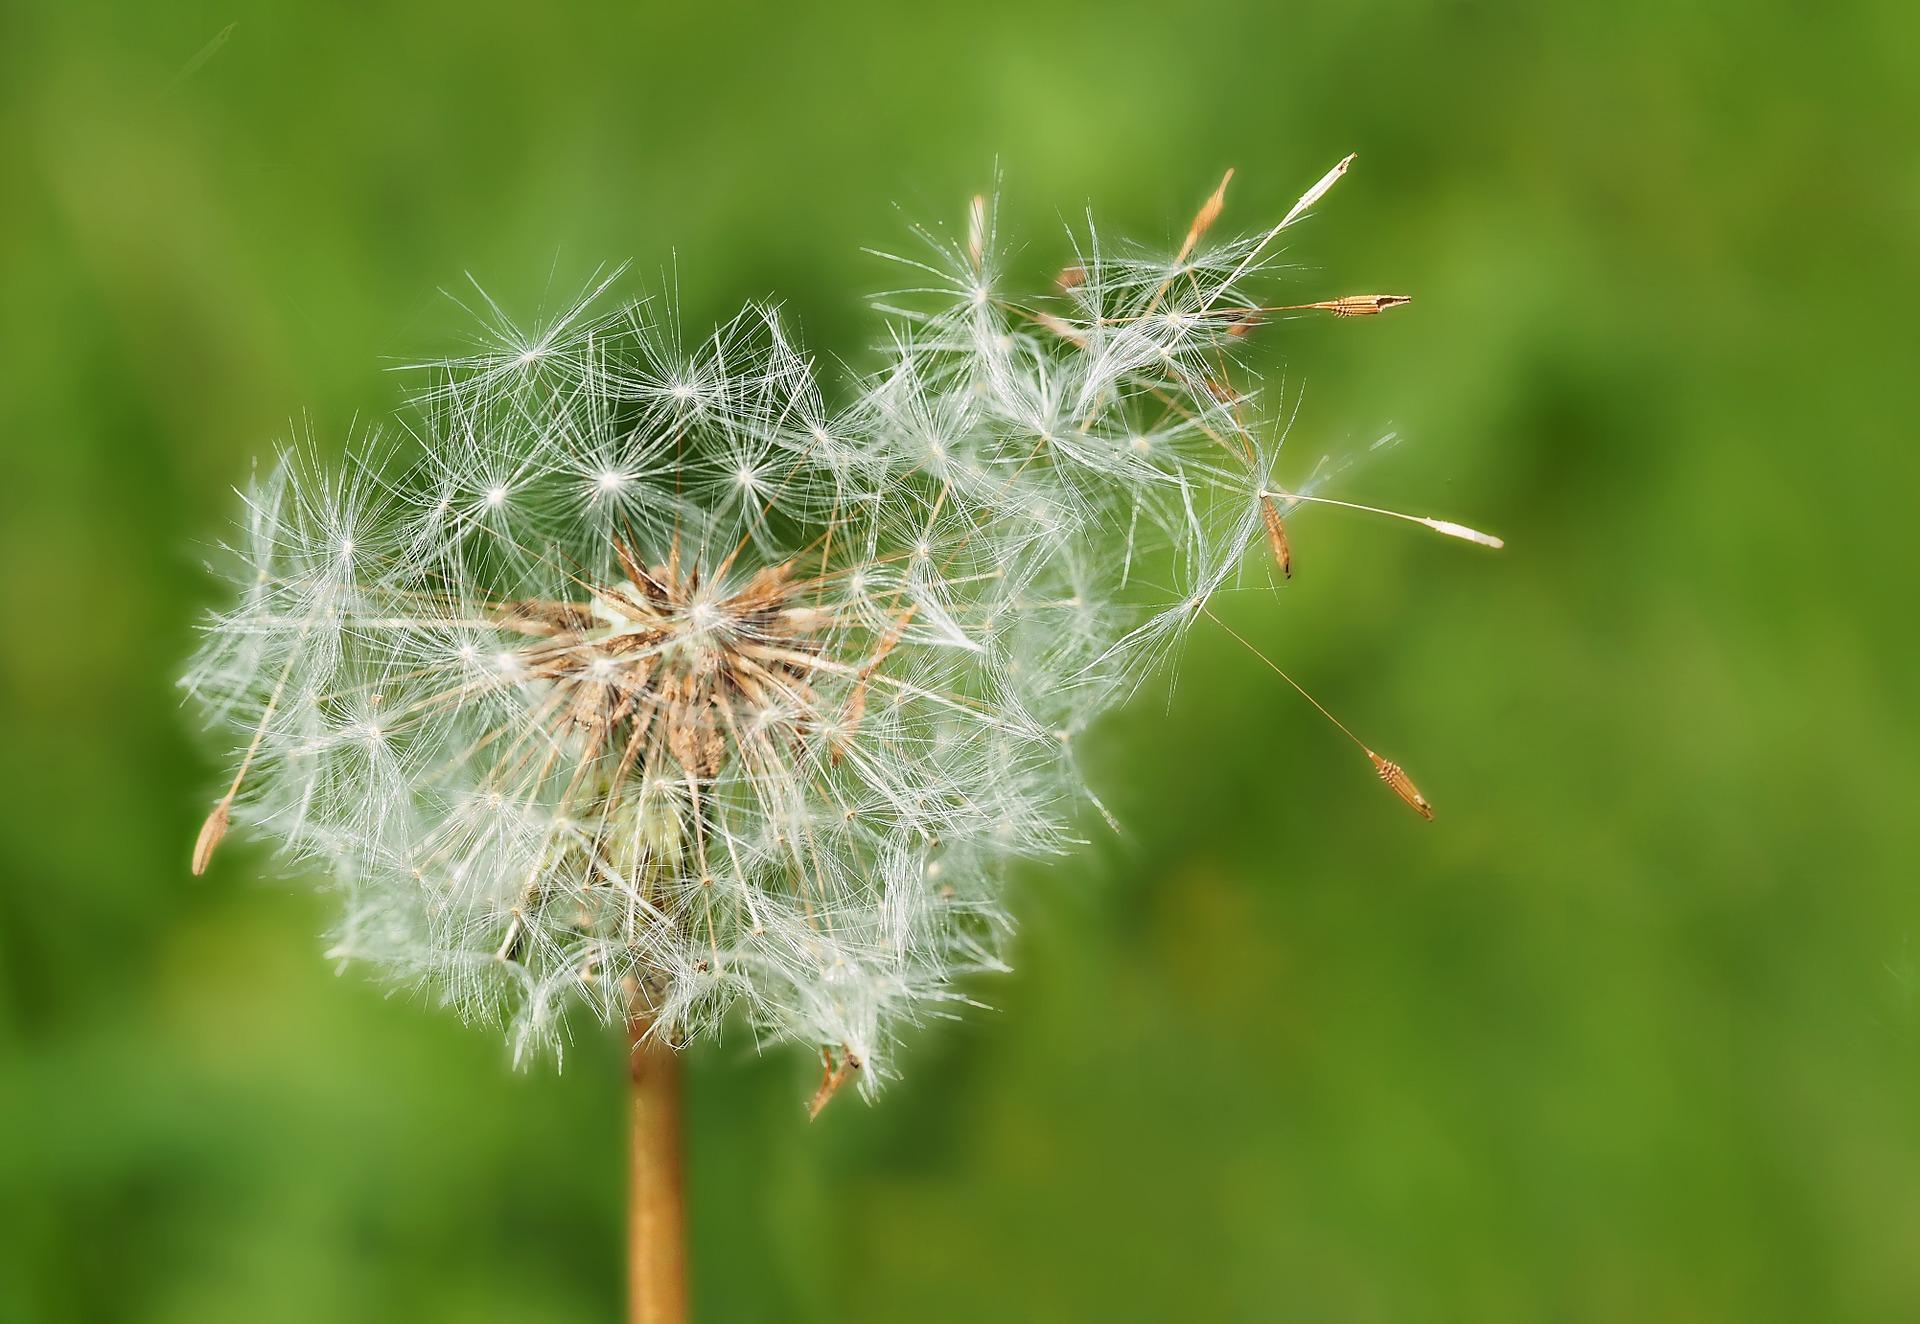 dandelion-1335575_1920